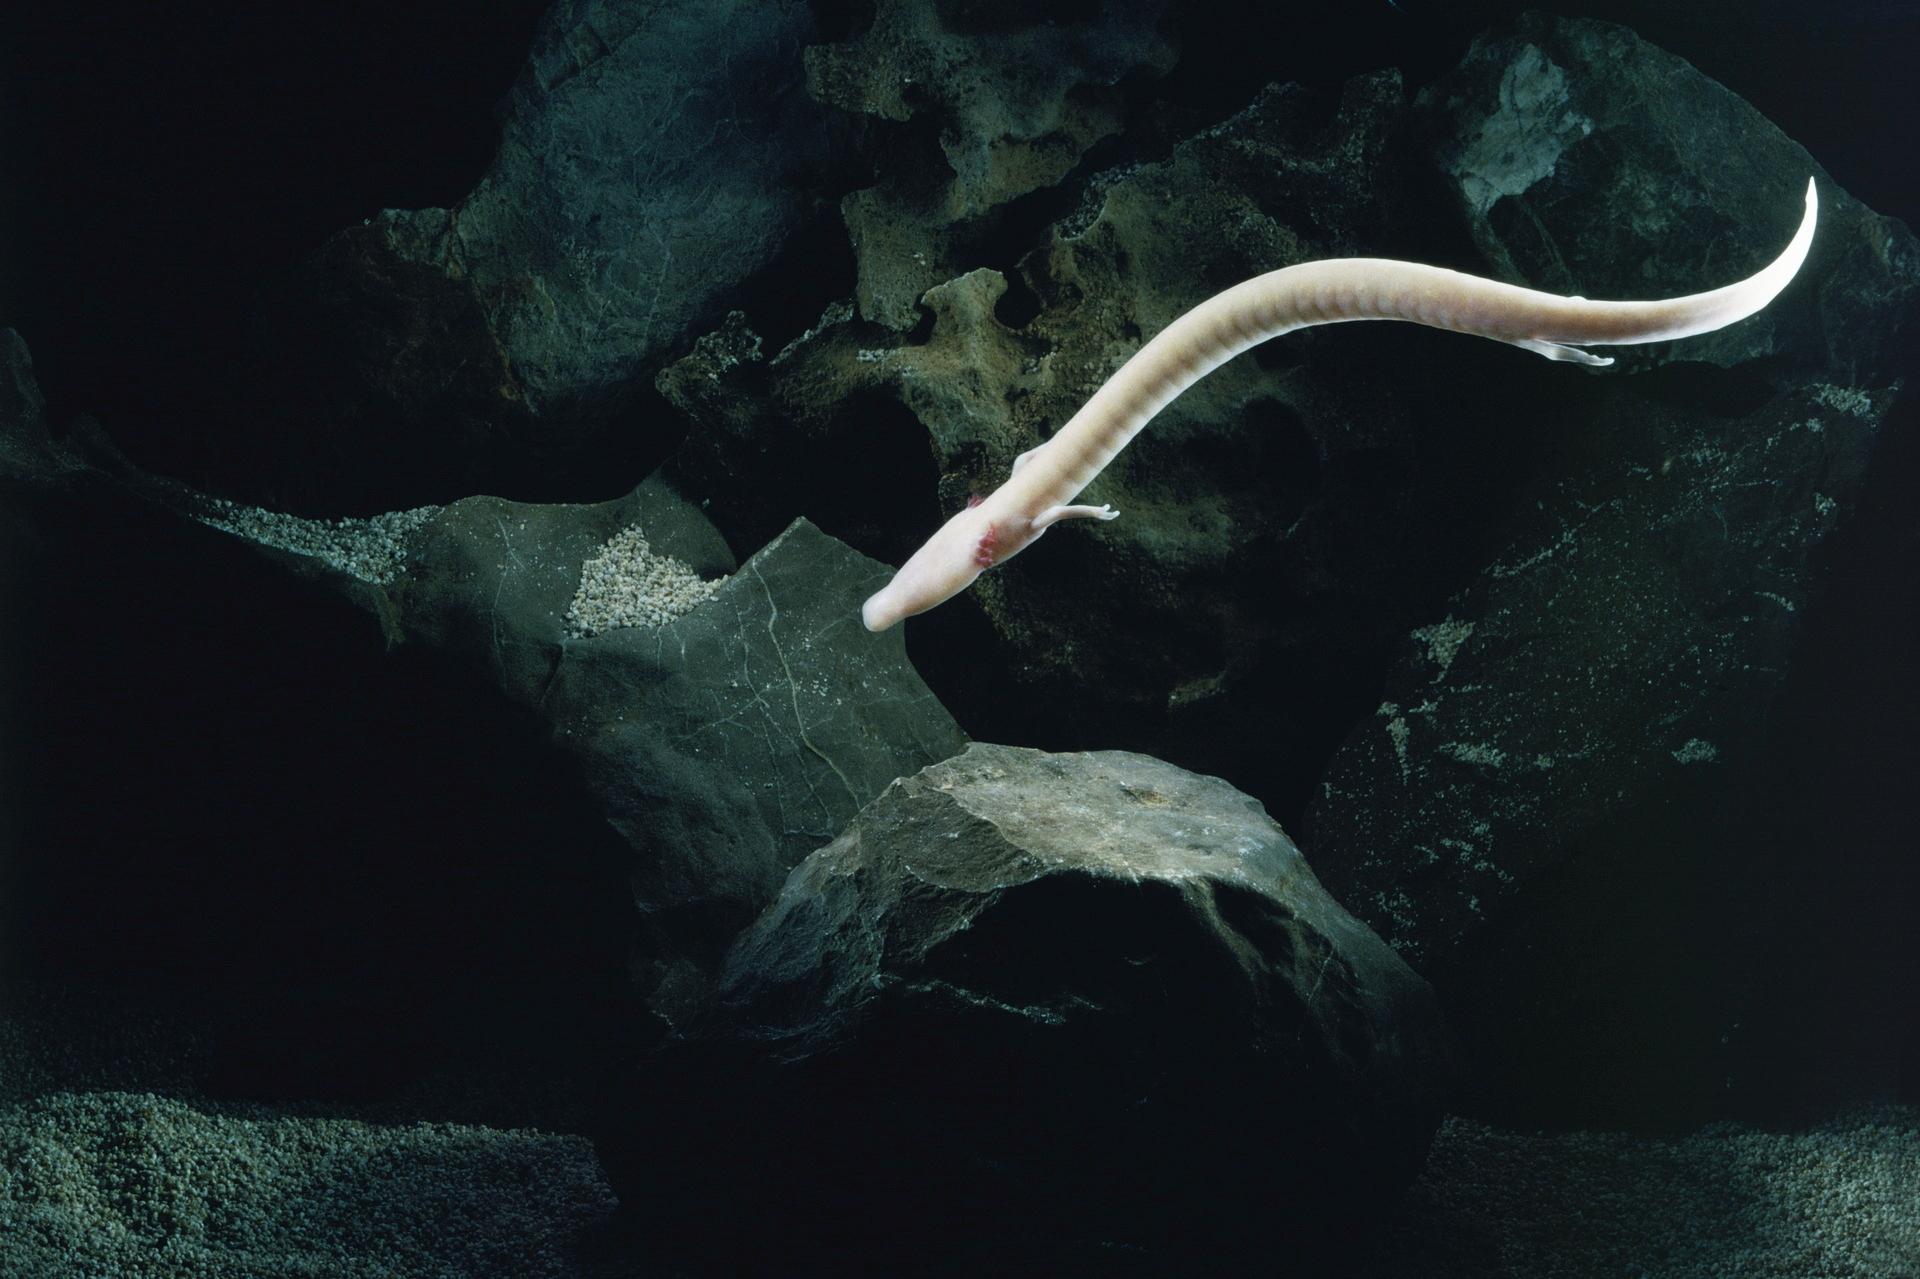 Cave Salamanders Live 100 Years P_anguinus1